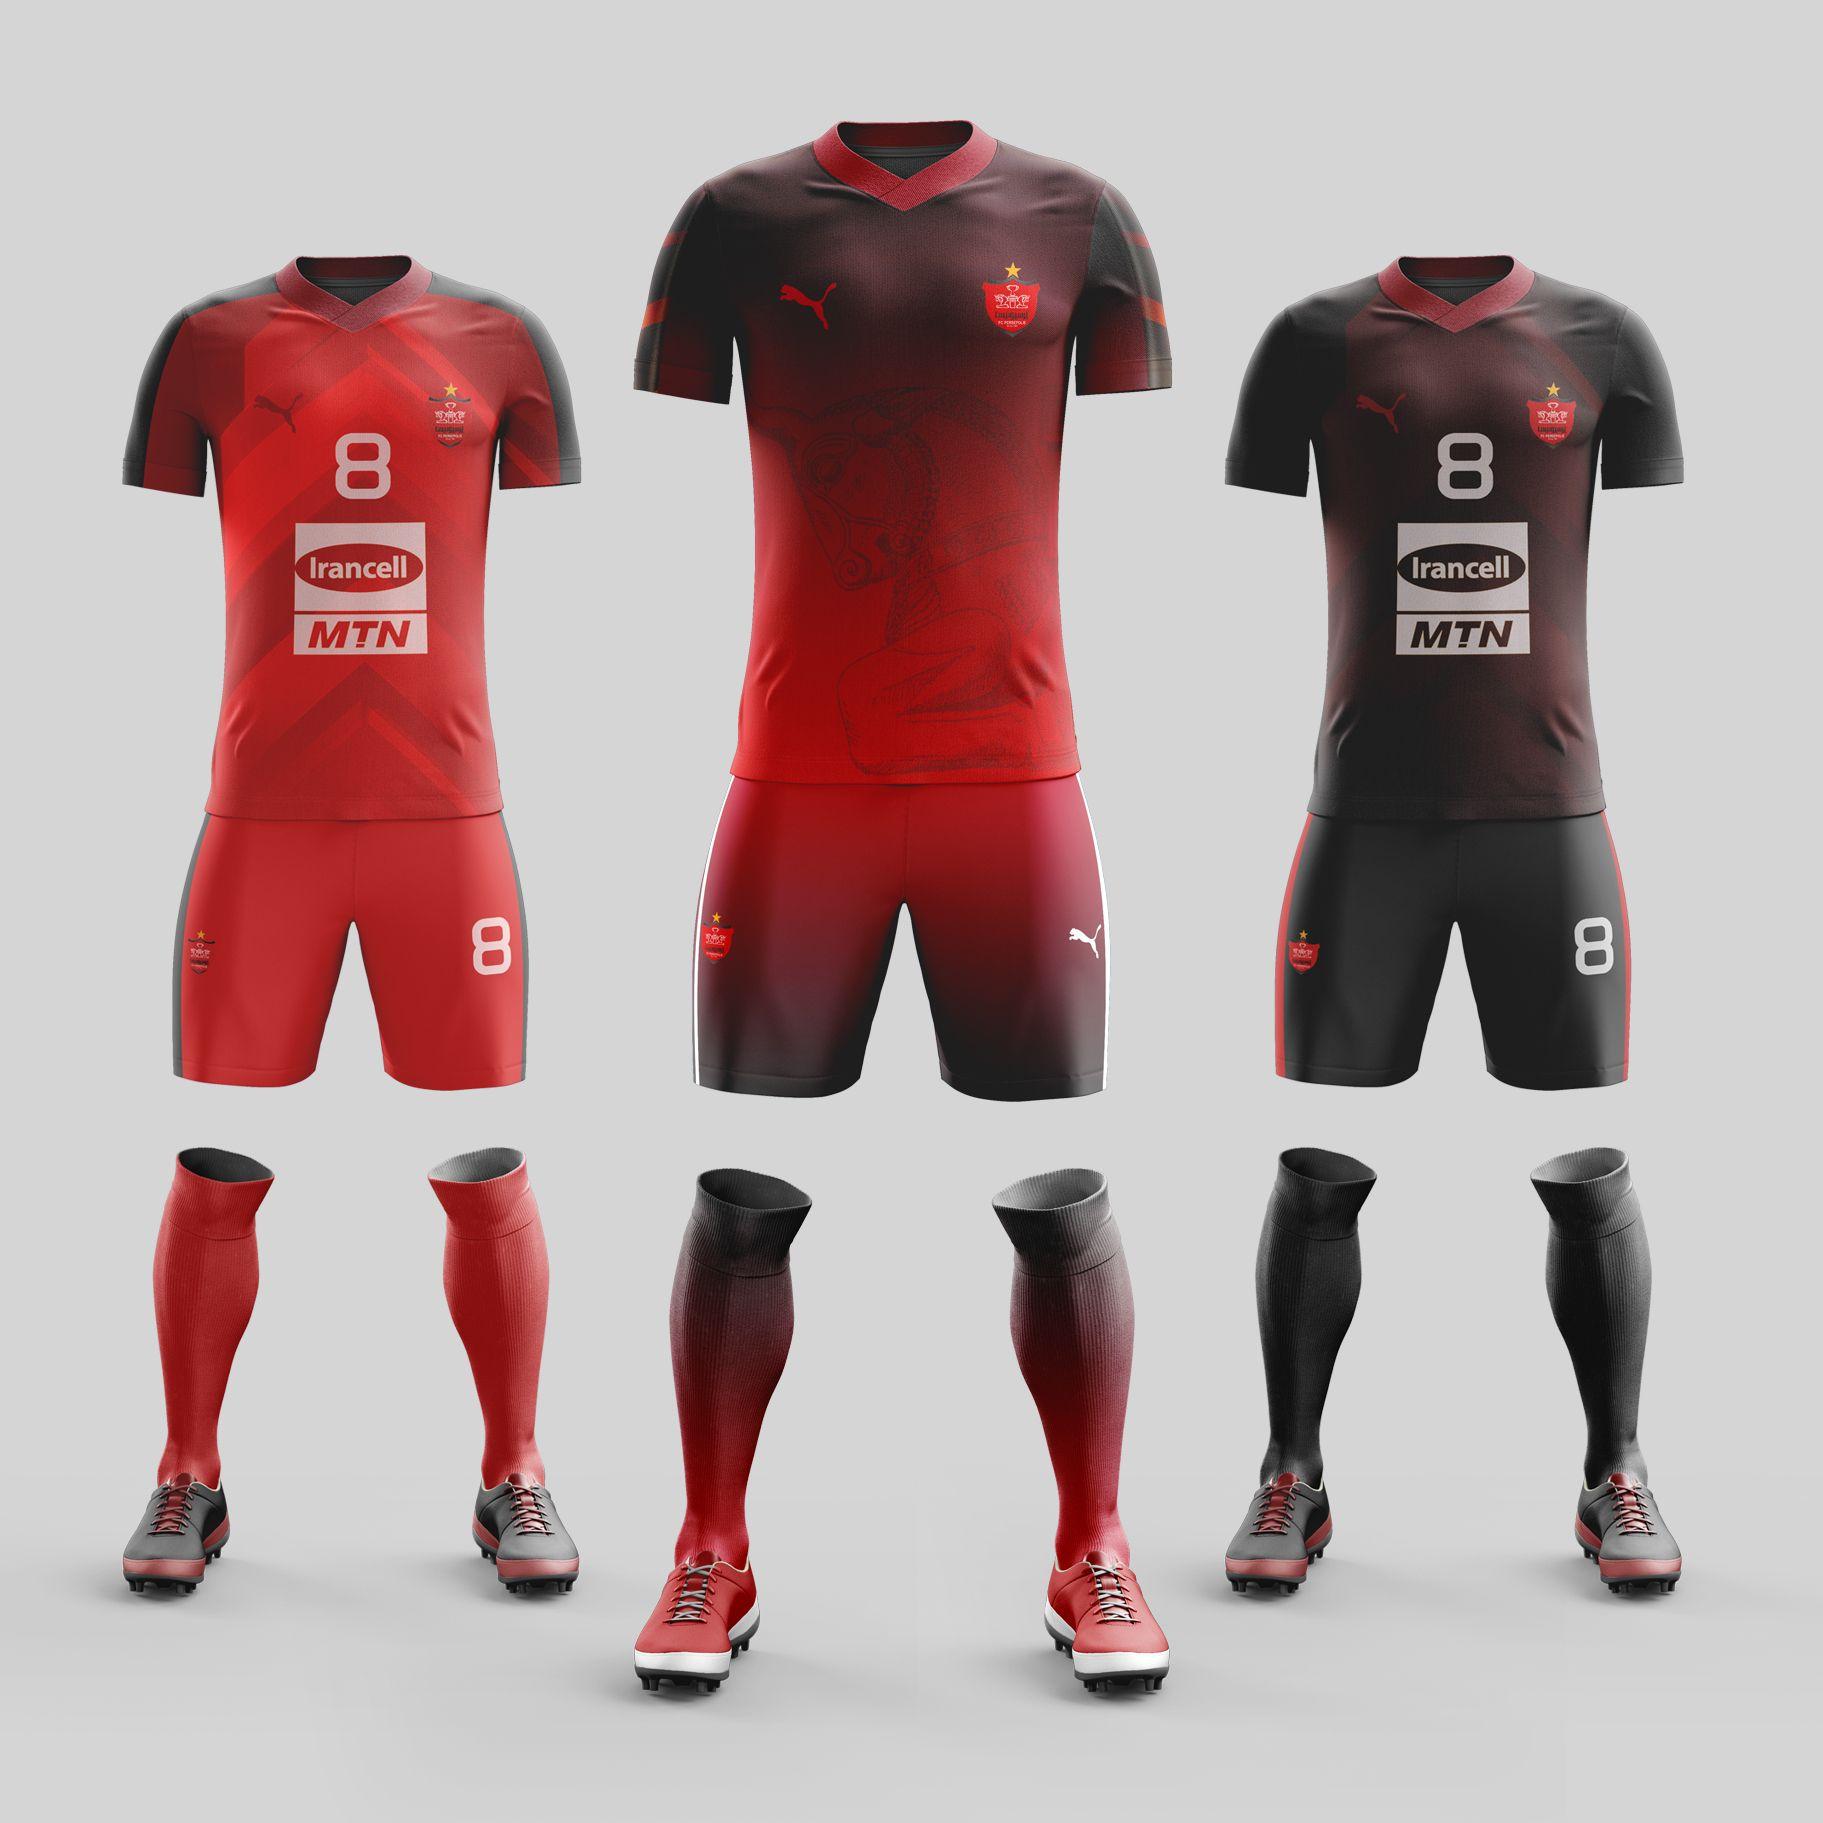 cheap for discount 387d1 e4d1d Perspolis Soccer Kit Design 2019 طراحی کیت تیم فوتبال ...